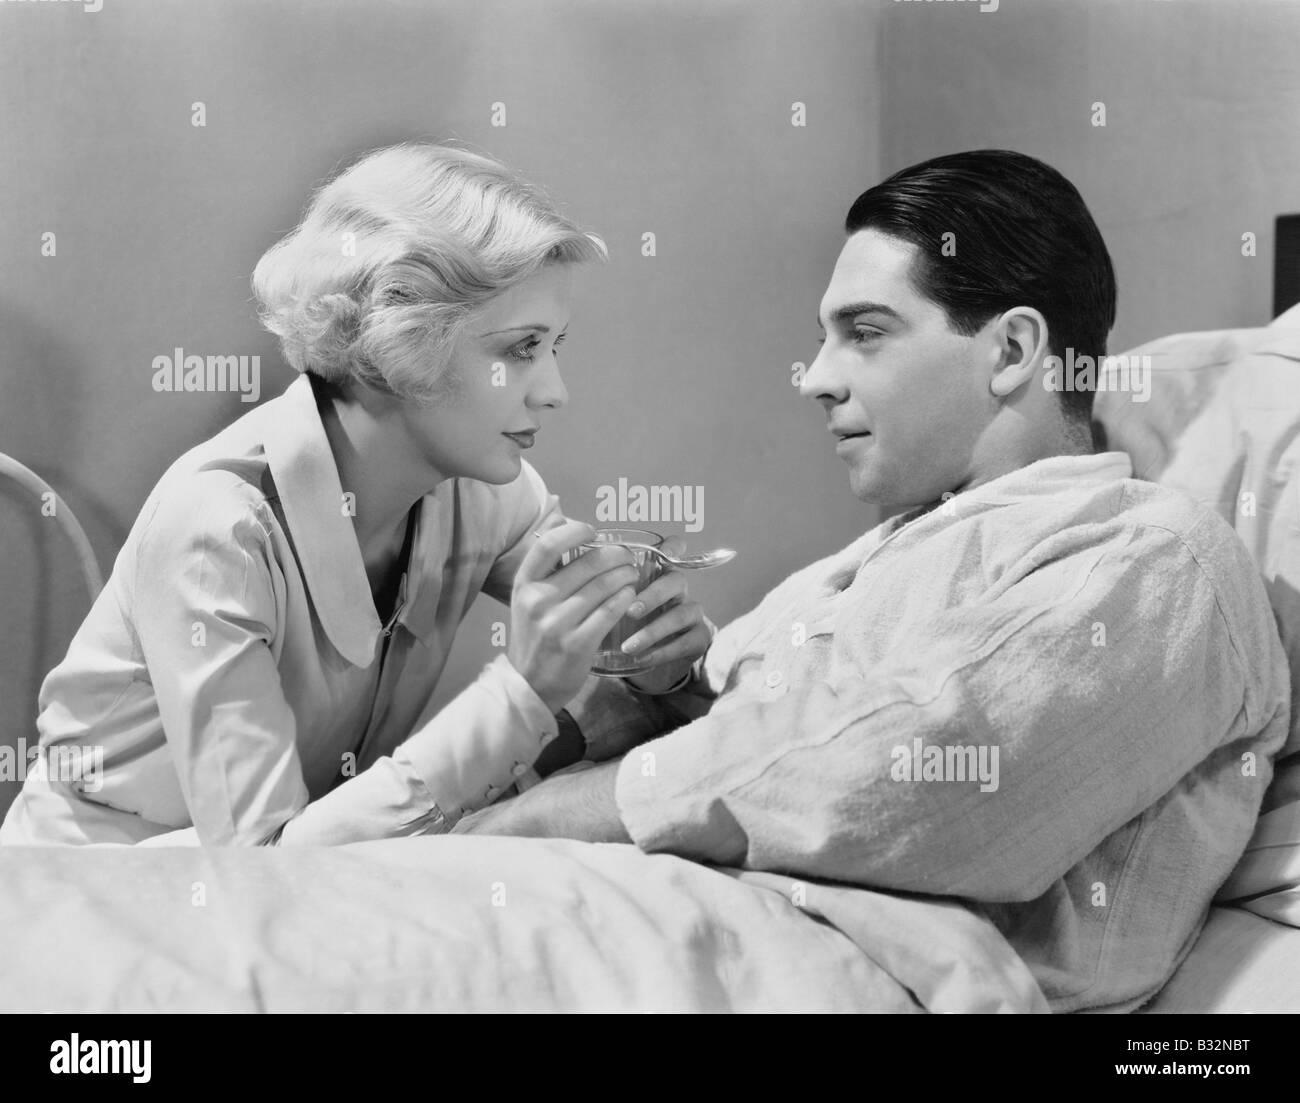 Woman feeding patient Stock Photo